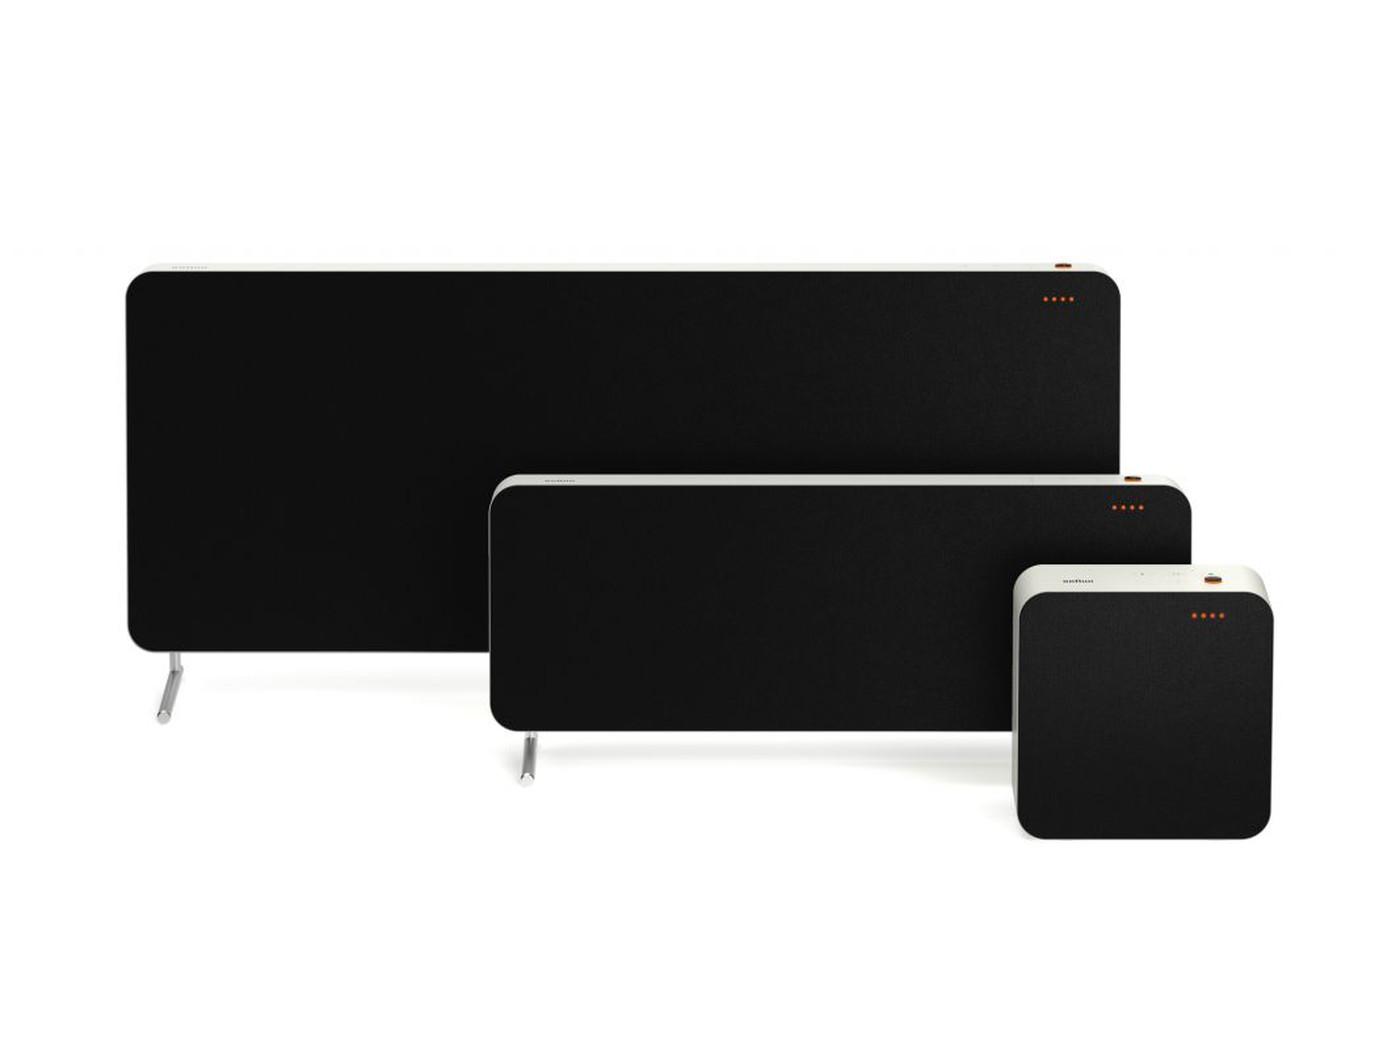 Braun's iconic speakers get a modern update